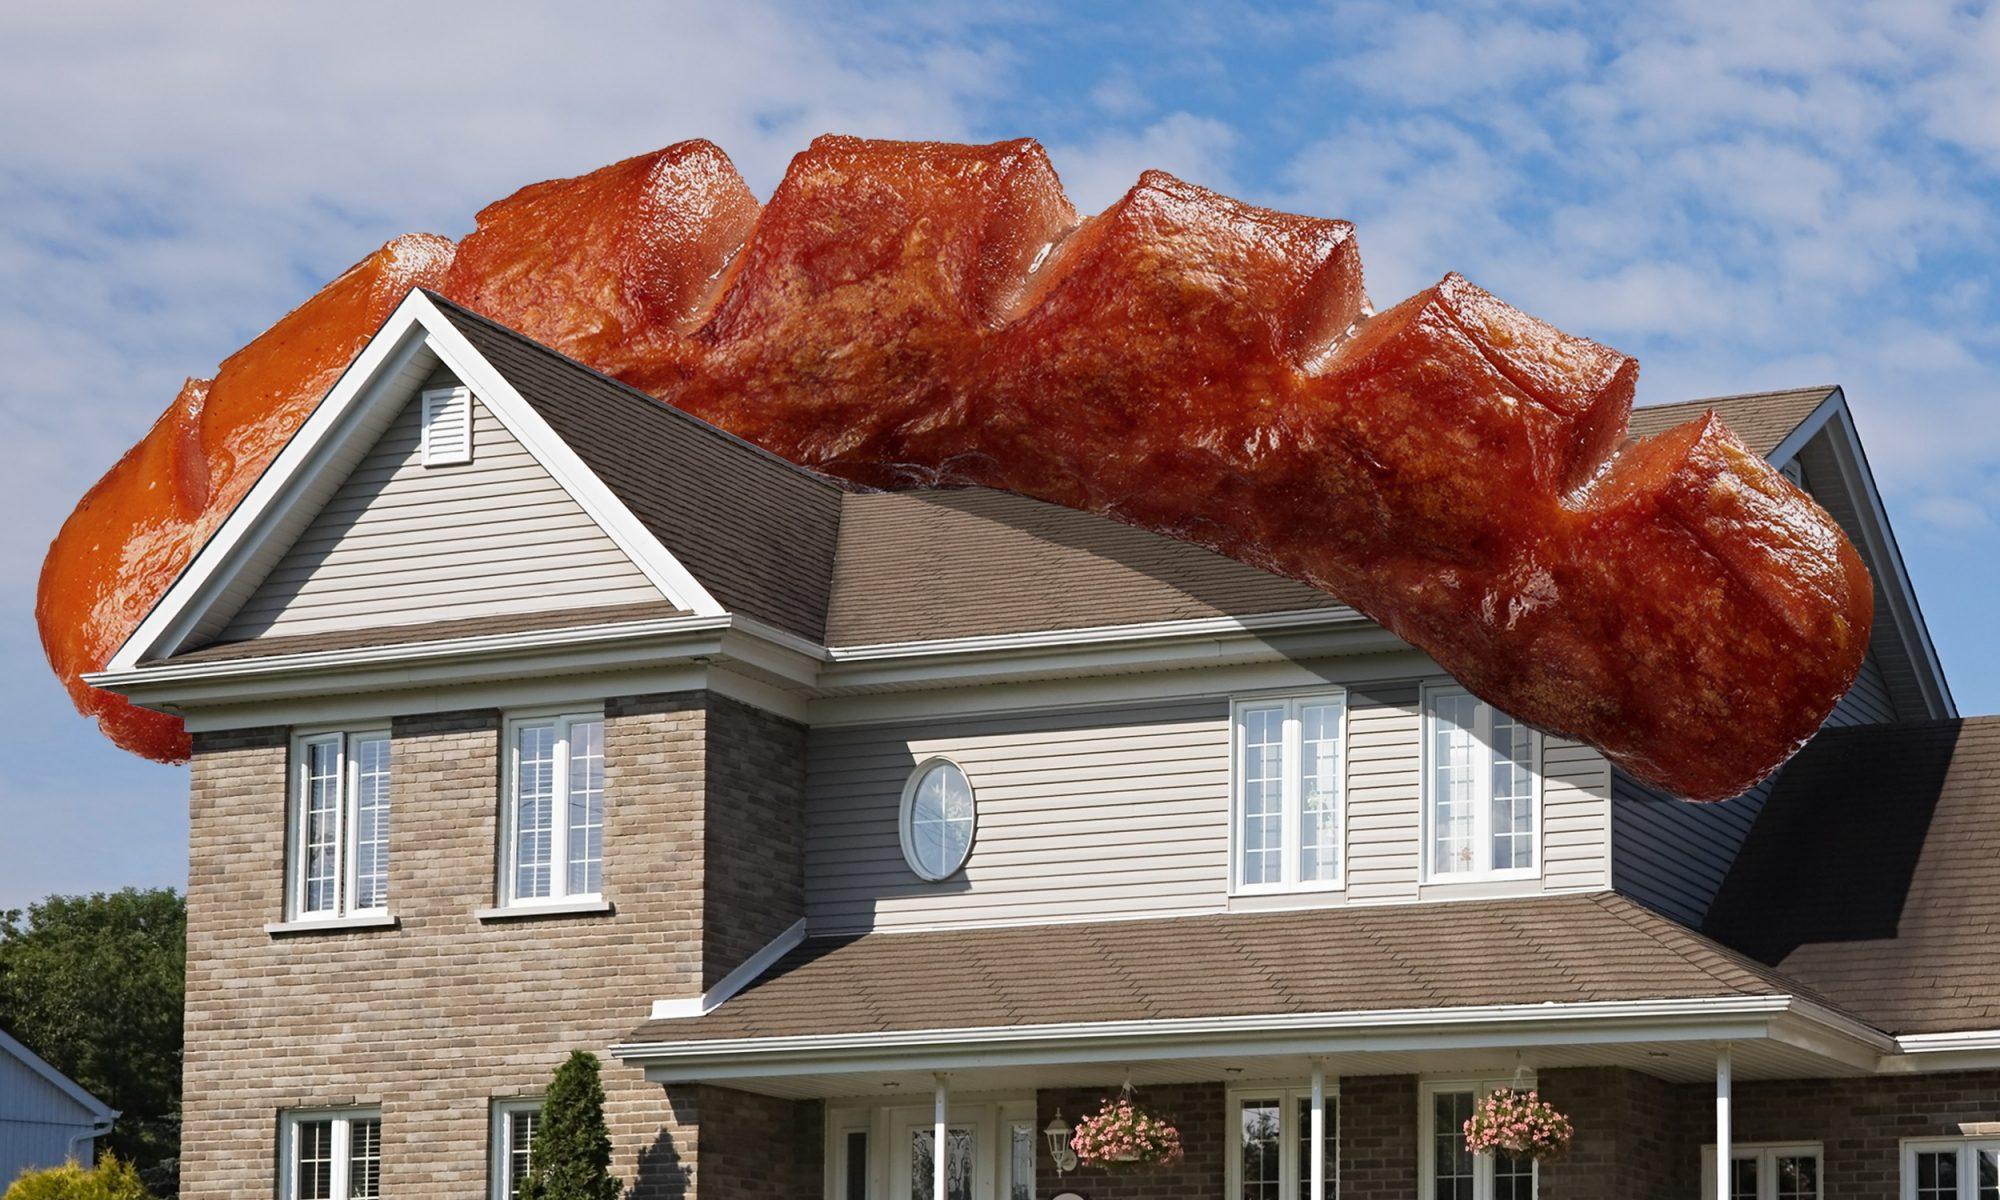 EC: 15 Pounds of Italian Sausage Crashes onto Florida Family's Roof